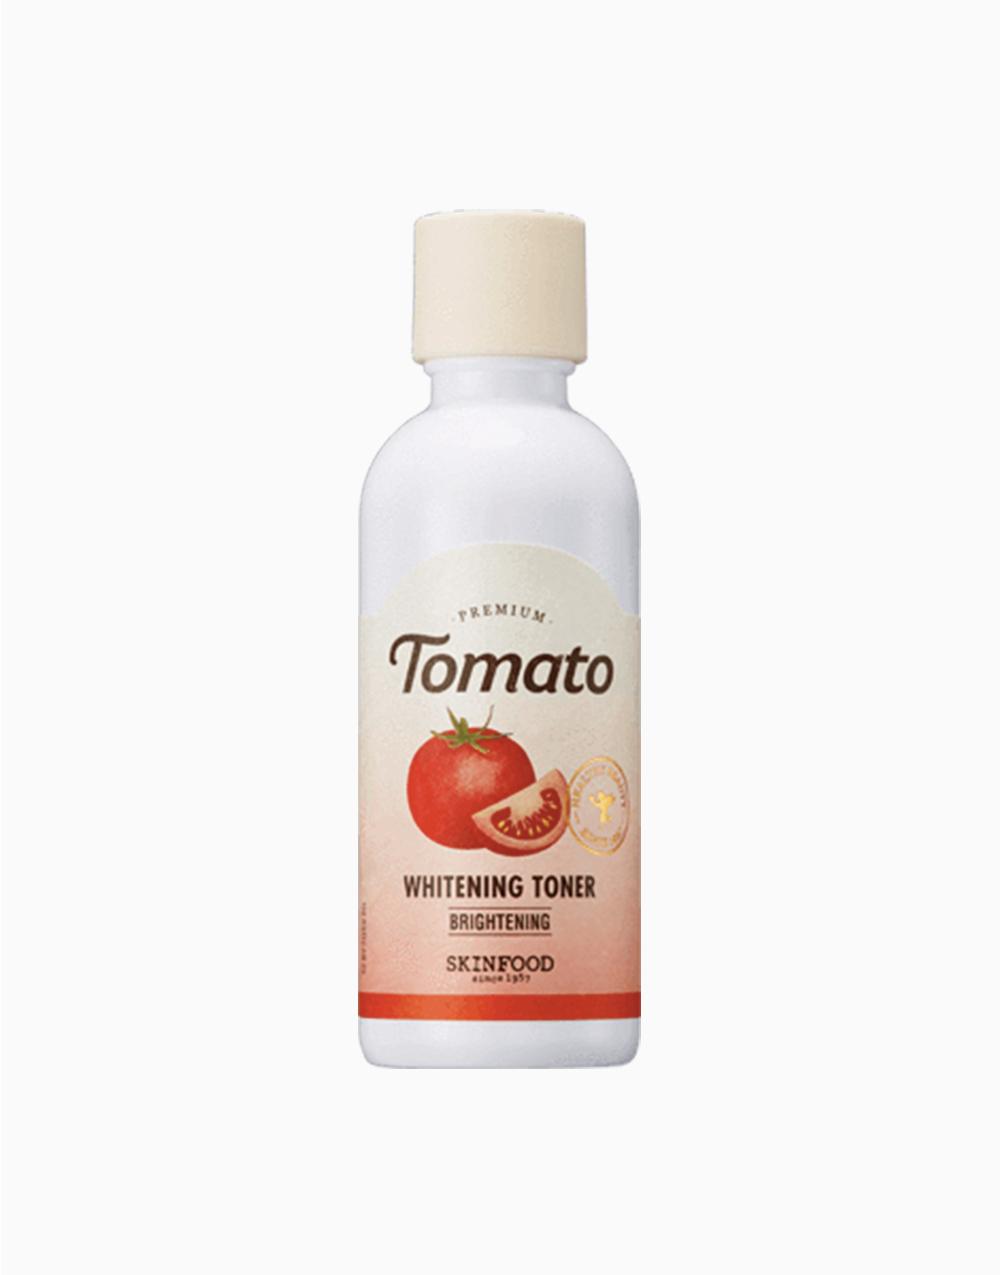 Premium Tomato Whitening Toner by Skinfood